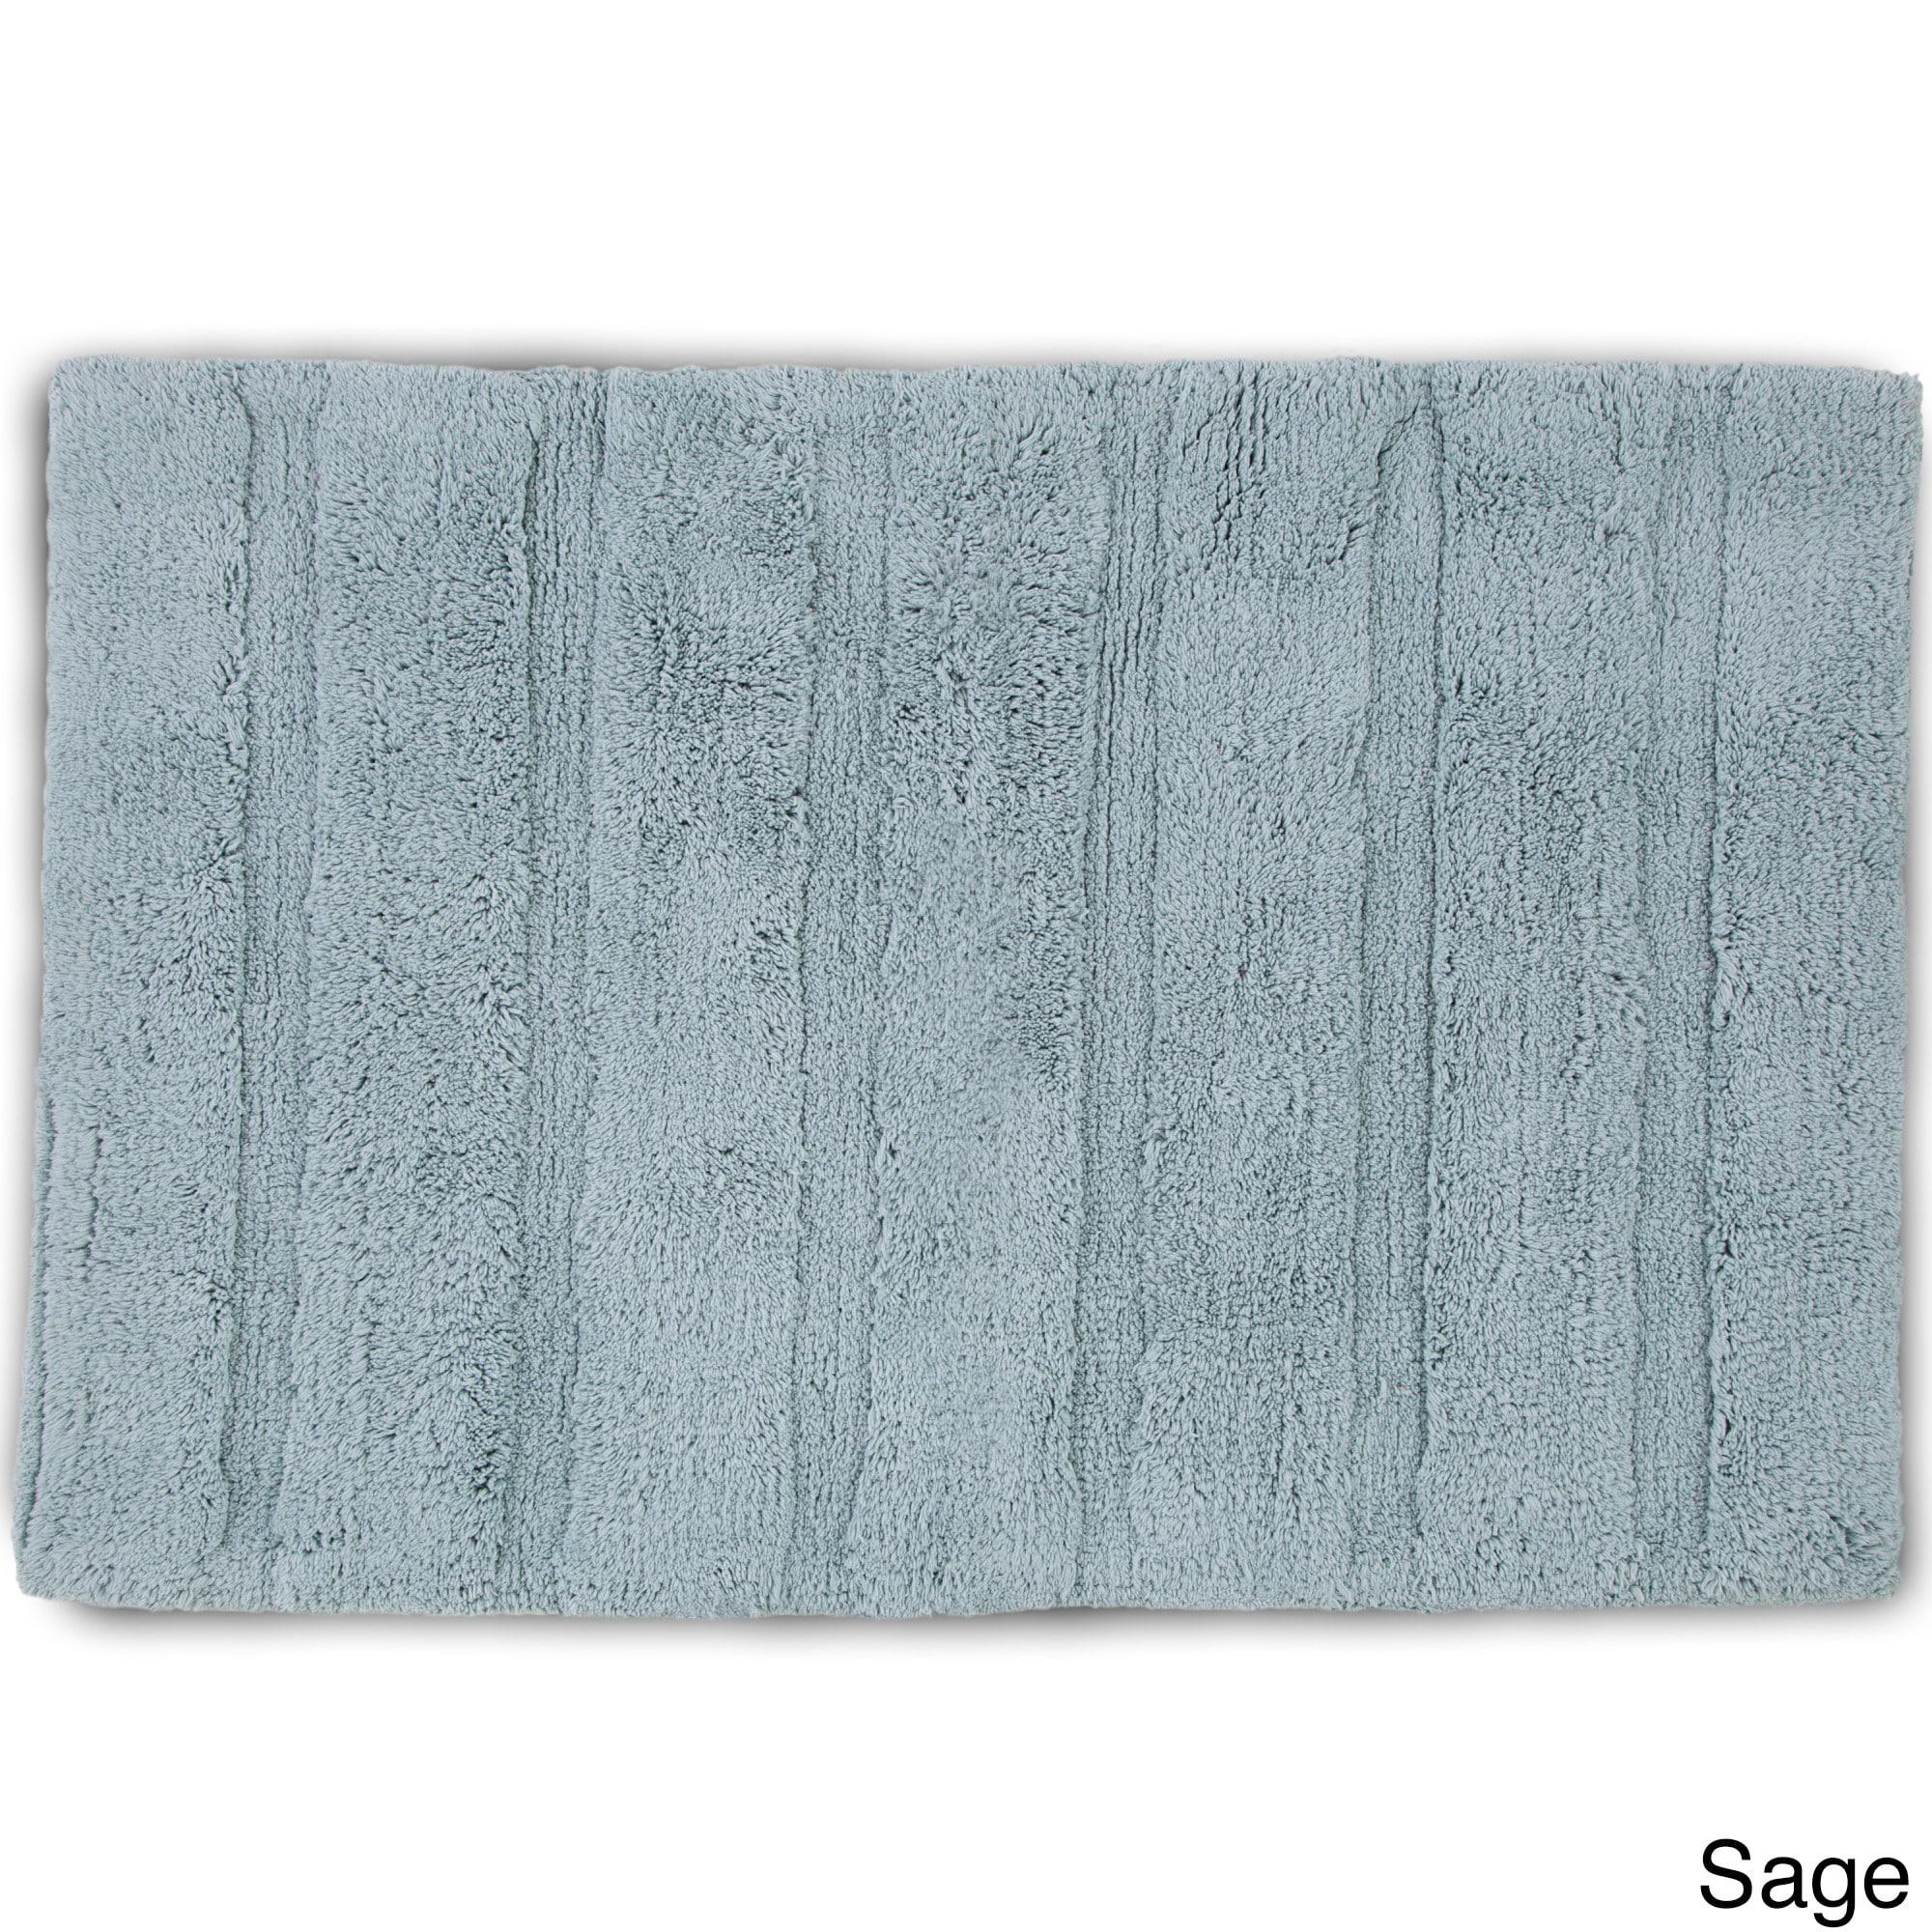 martex abundance bath rug w non skid backing available in 6 colors ebay. Black Bedroom Furniture Sets. Home Design Ideas